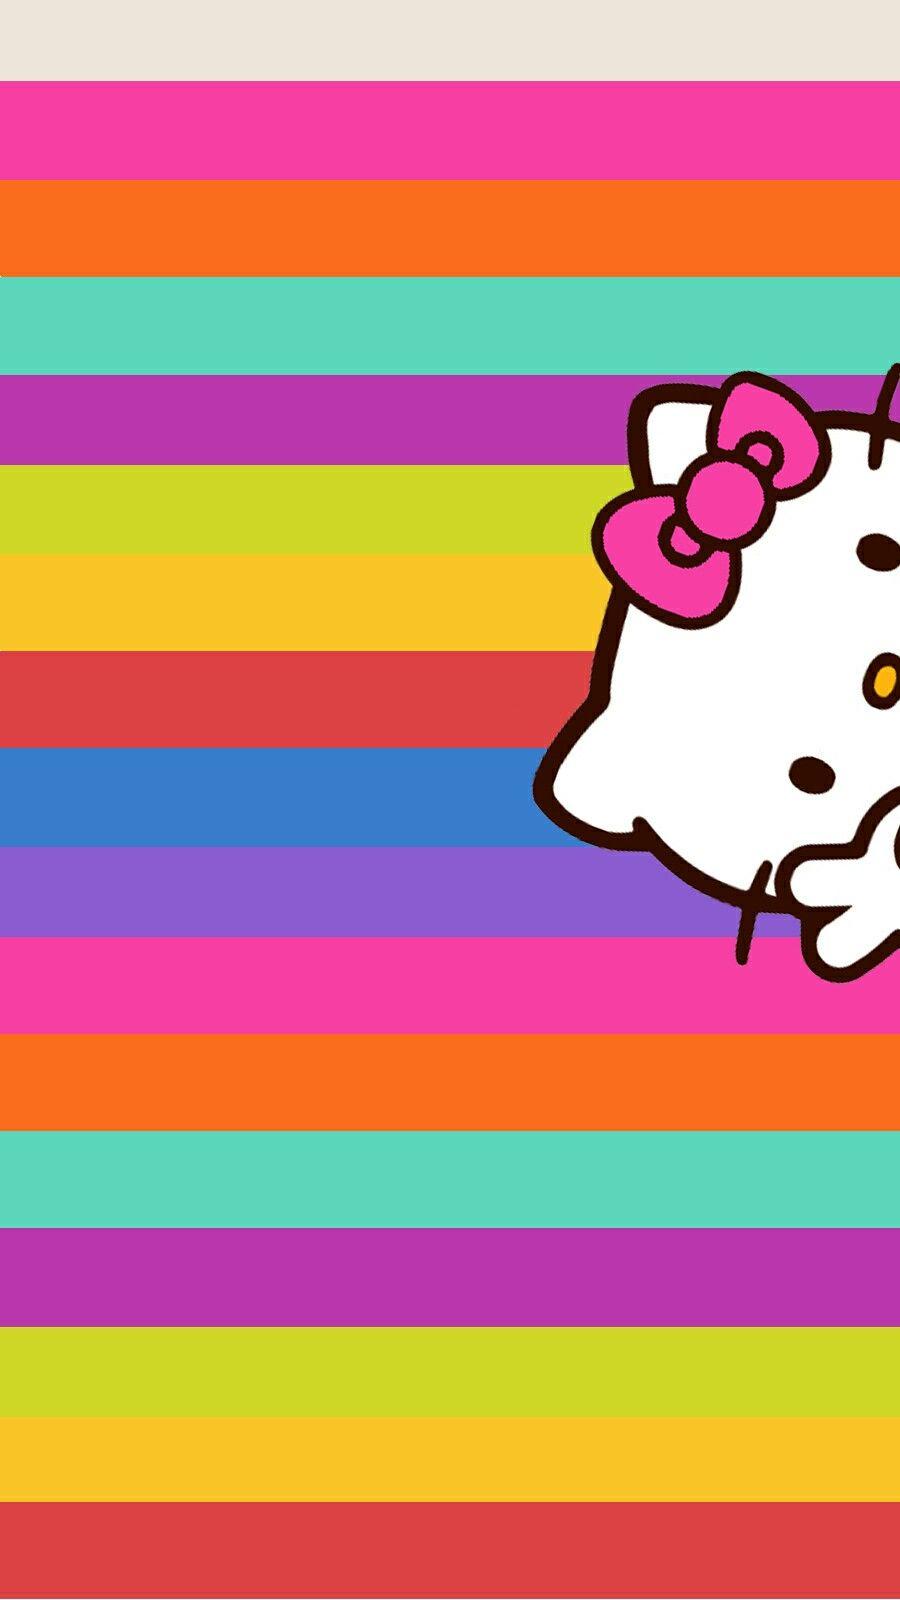 Must see Wallpaper Hello Kitty Orange - 78fdf7cec8f5de916bafe92baf6e3795  Pictures_672210.jpg